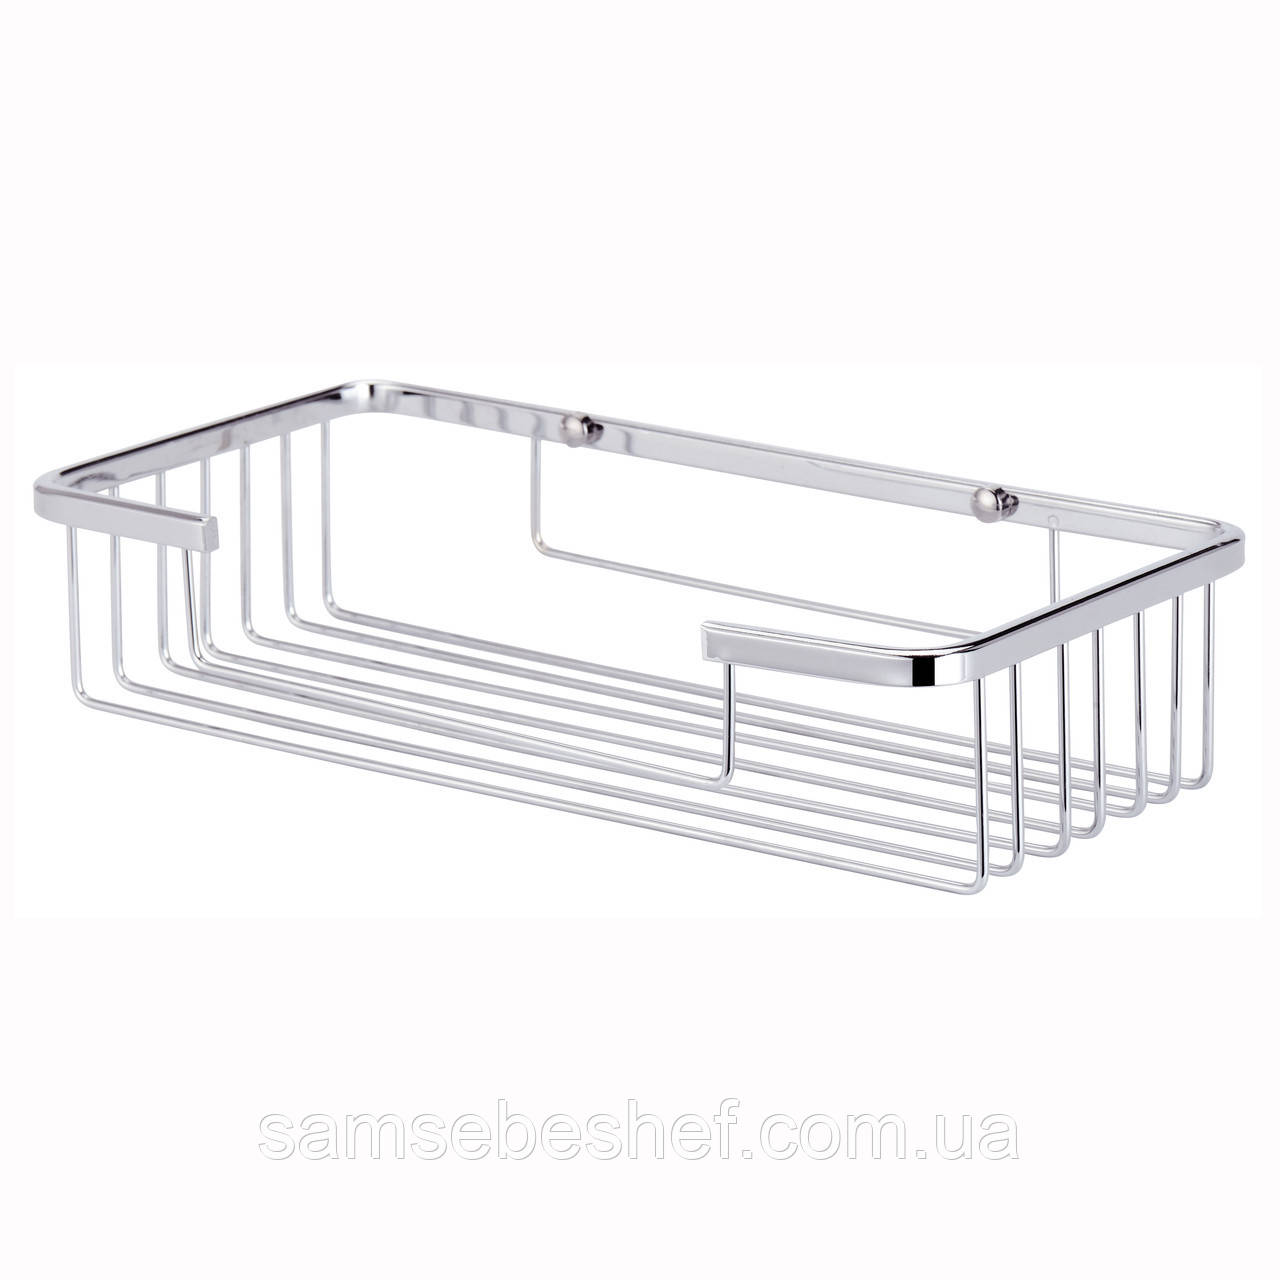 Корзинка для ванной Besser прямоугольная 25х12.5х5.5см KM-8504